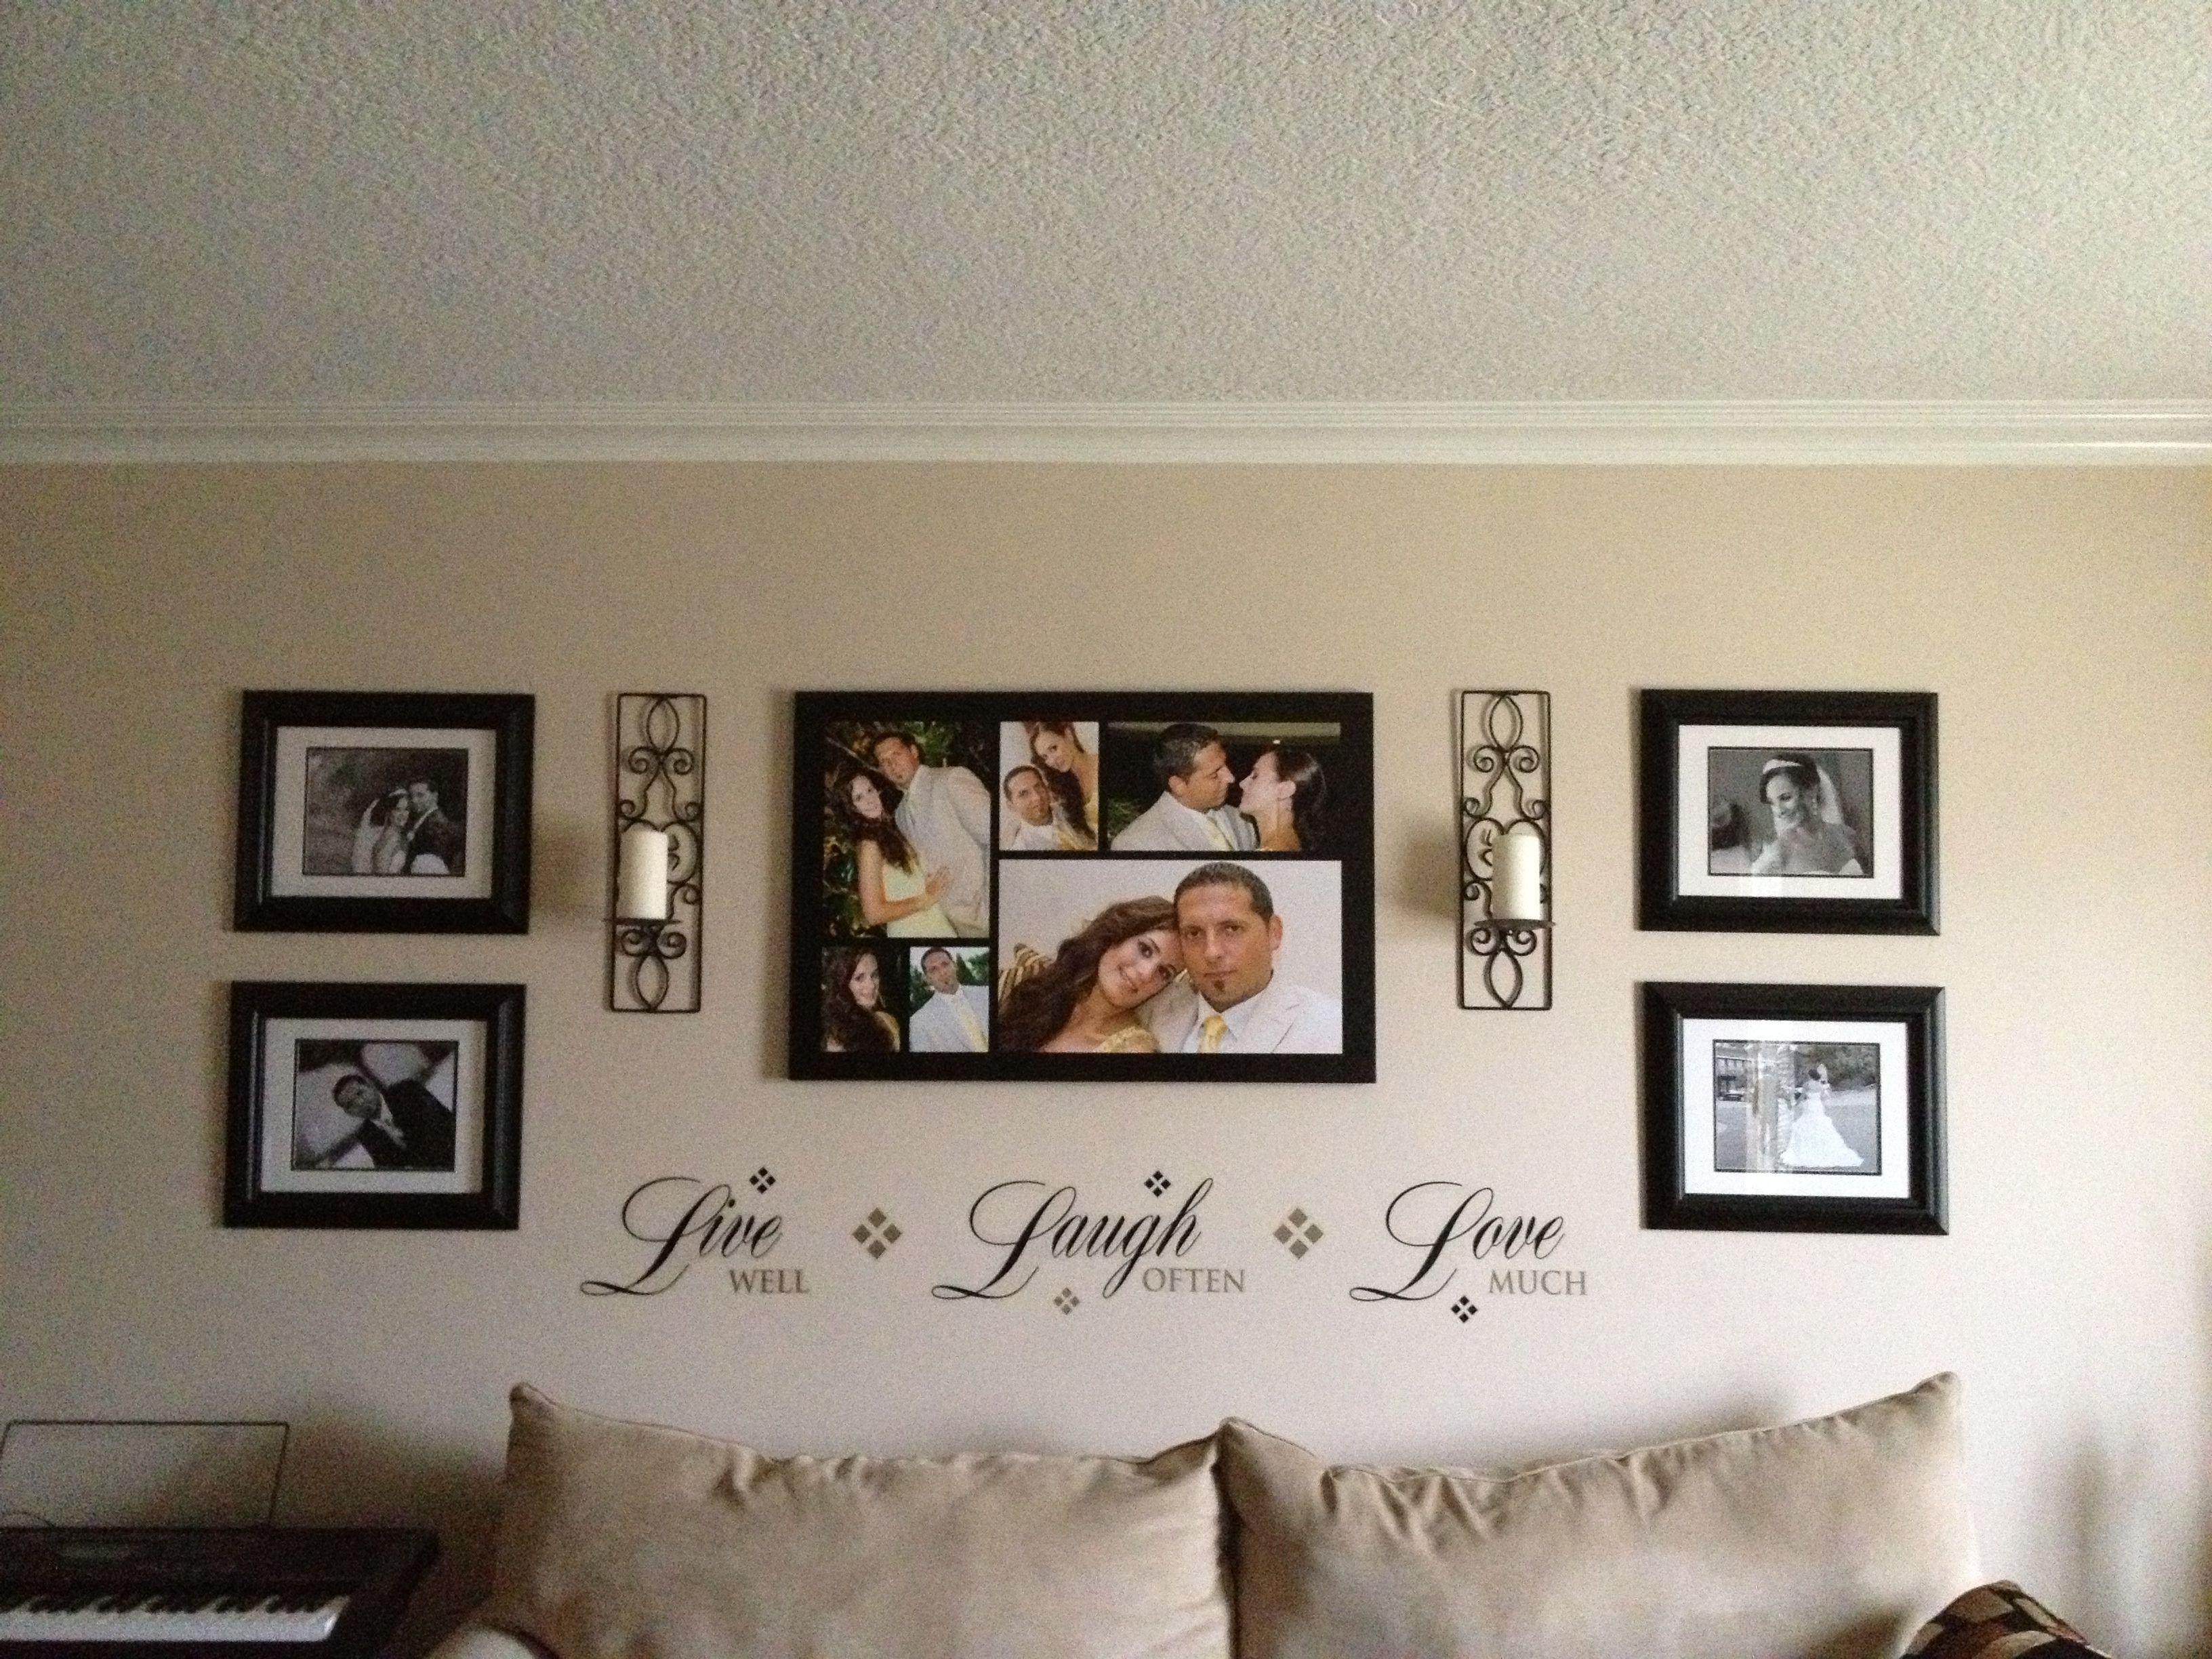 Most Top Design Bedroom Wall Decor Frames Home Decor Decor